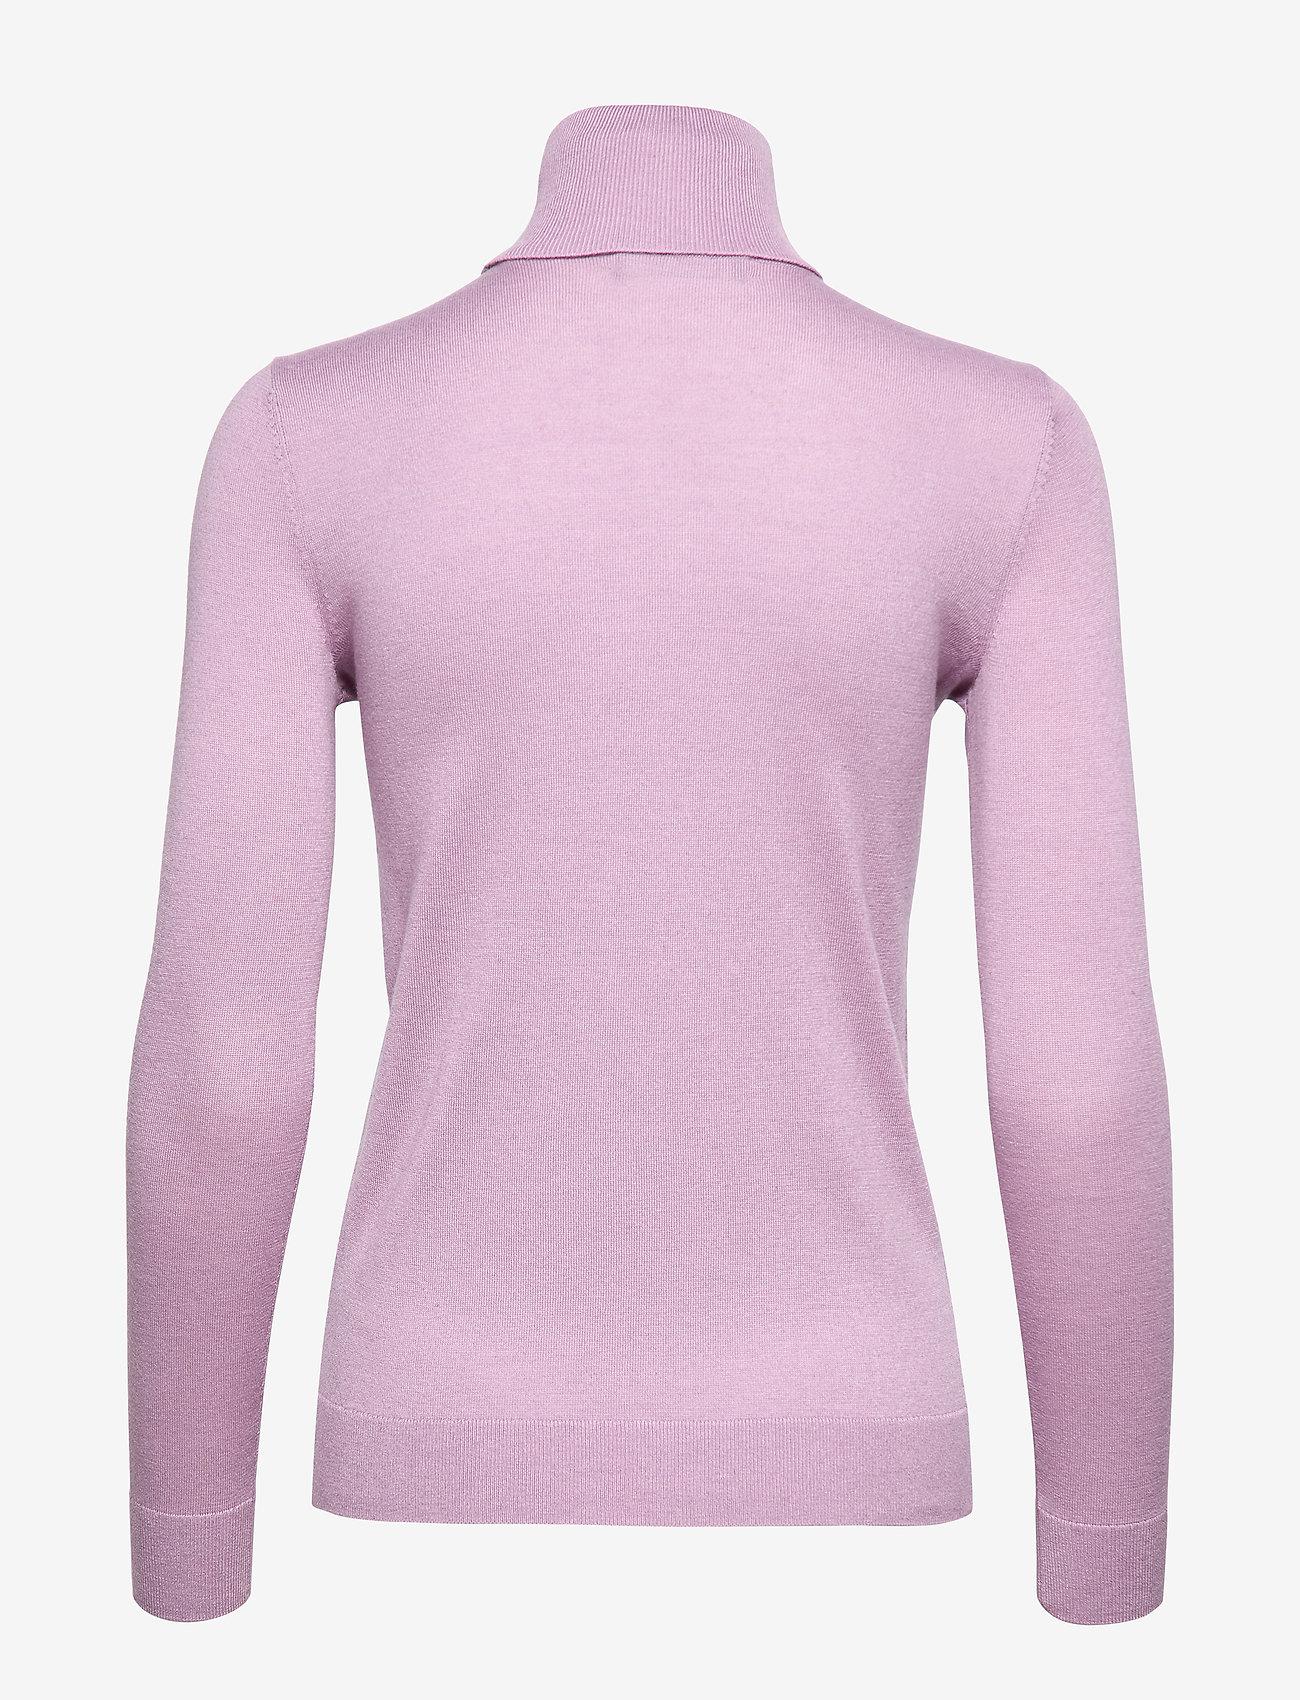 Lauren Ralph Lauren Ribbed Silk-Blend Turtleneck - Dzianina PINK HYACINTH - Kobiety Odzież.